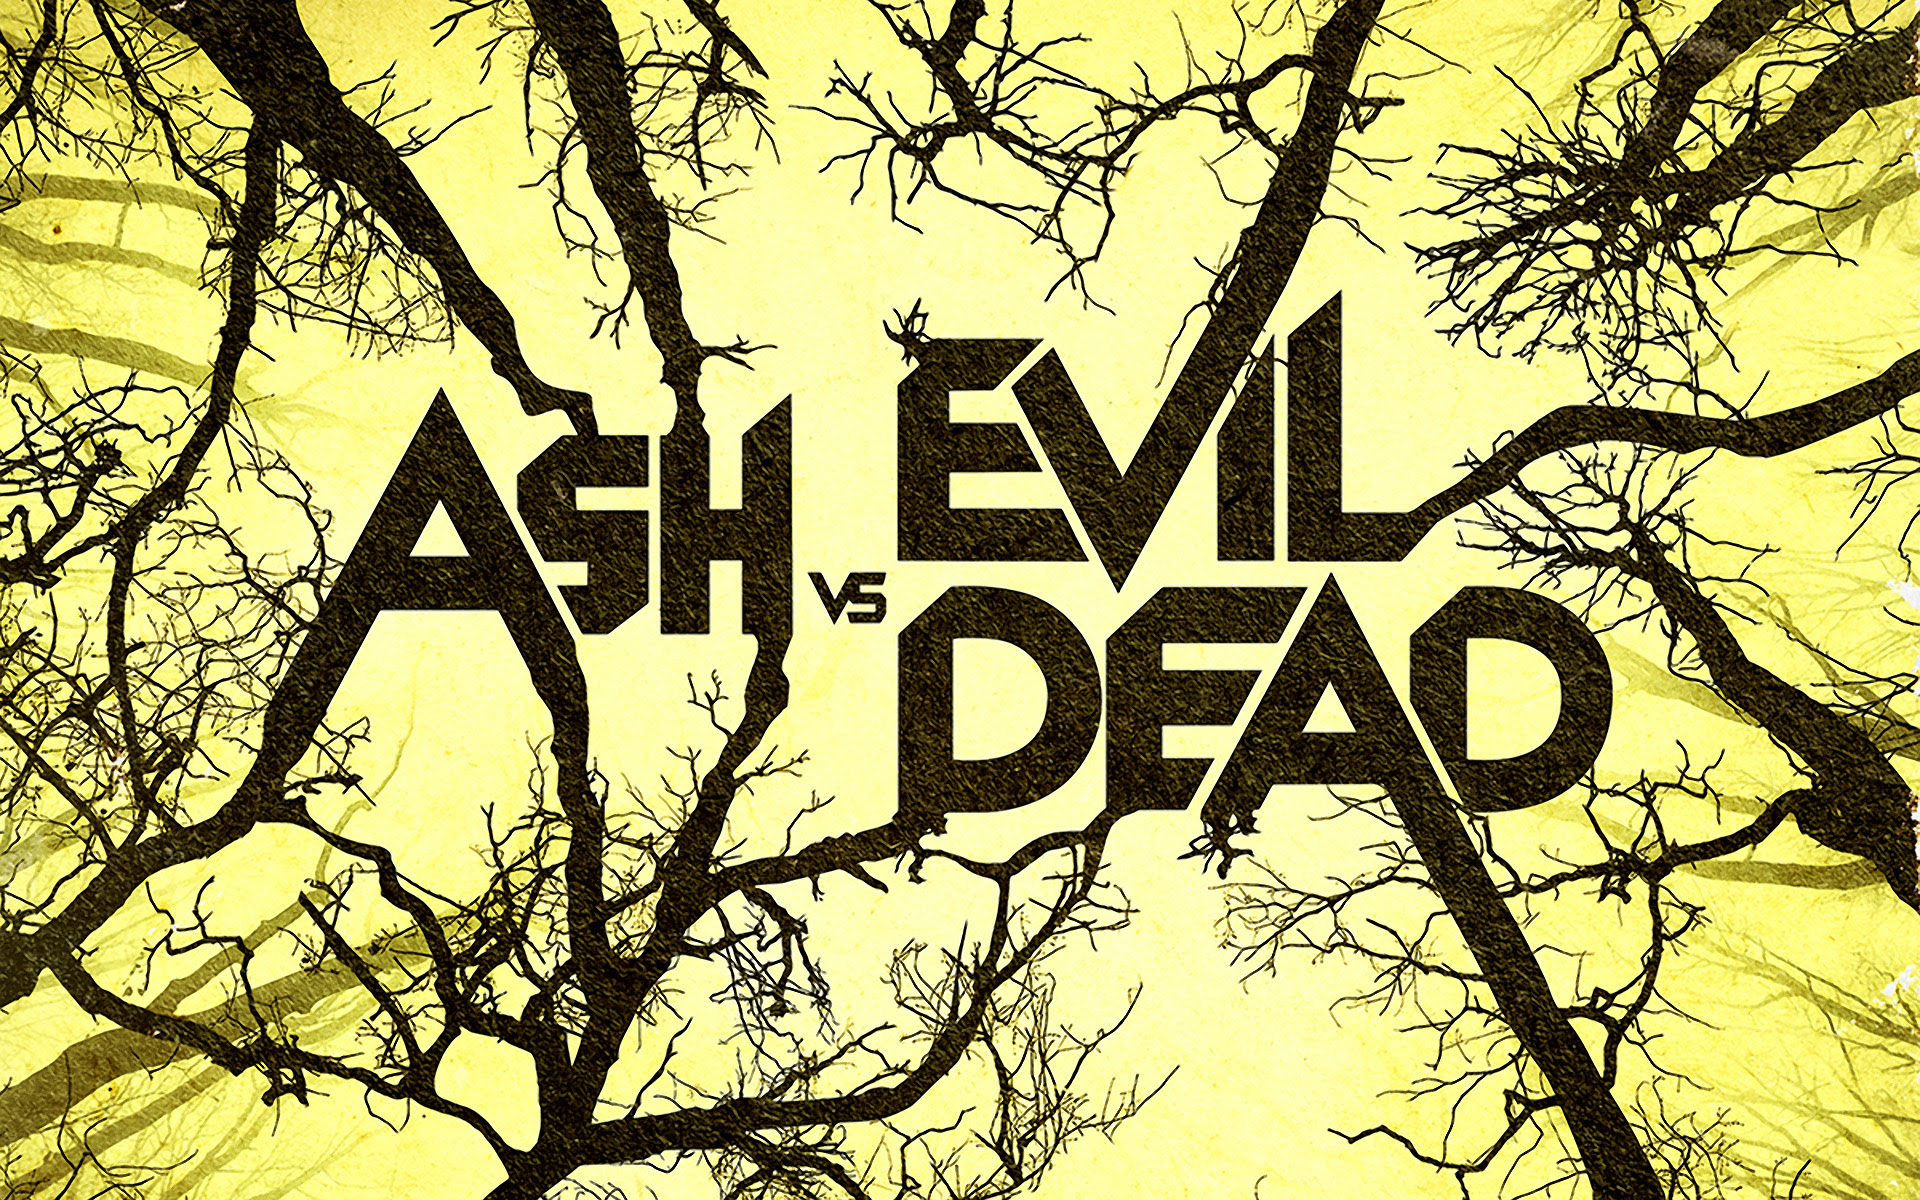 Ash Vs Evil Dead Ash Vs Evil Dead Wallpaper 40808693 Fanpop